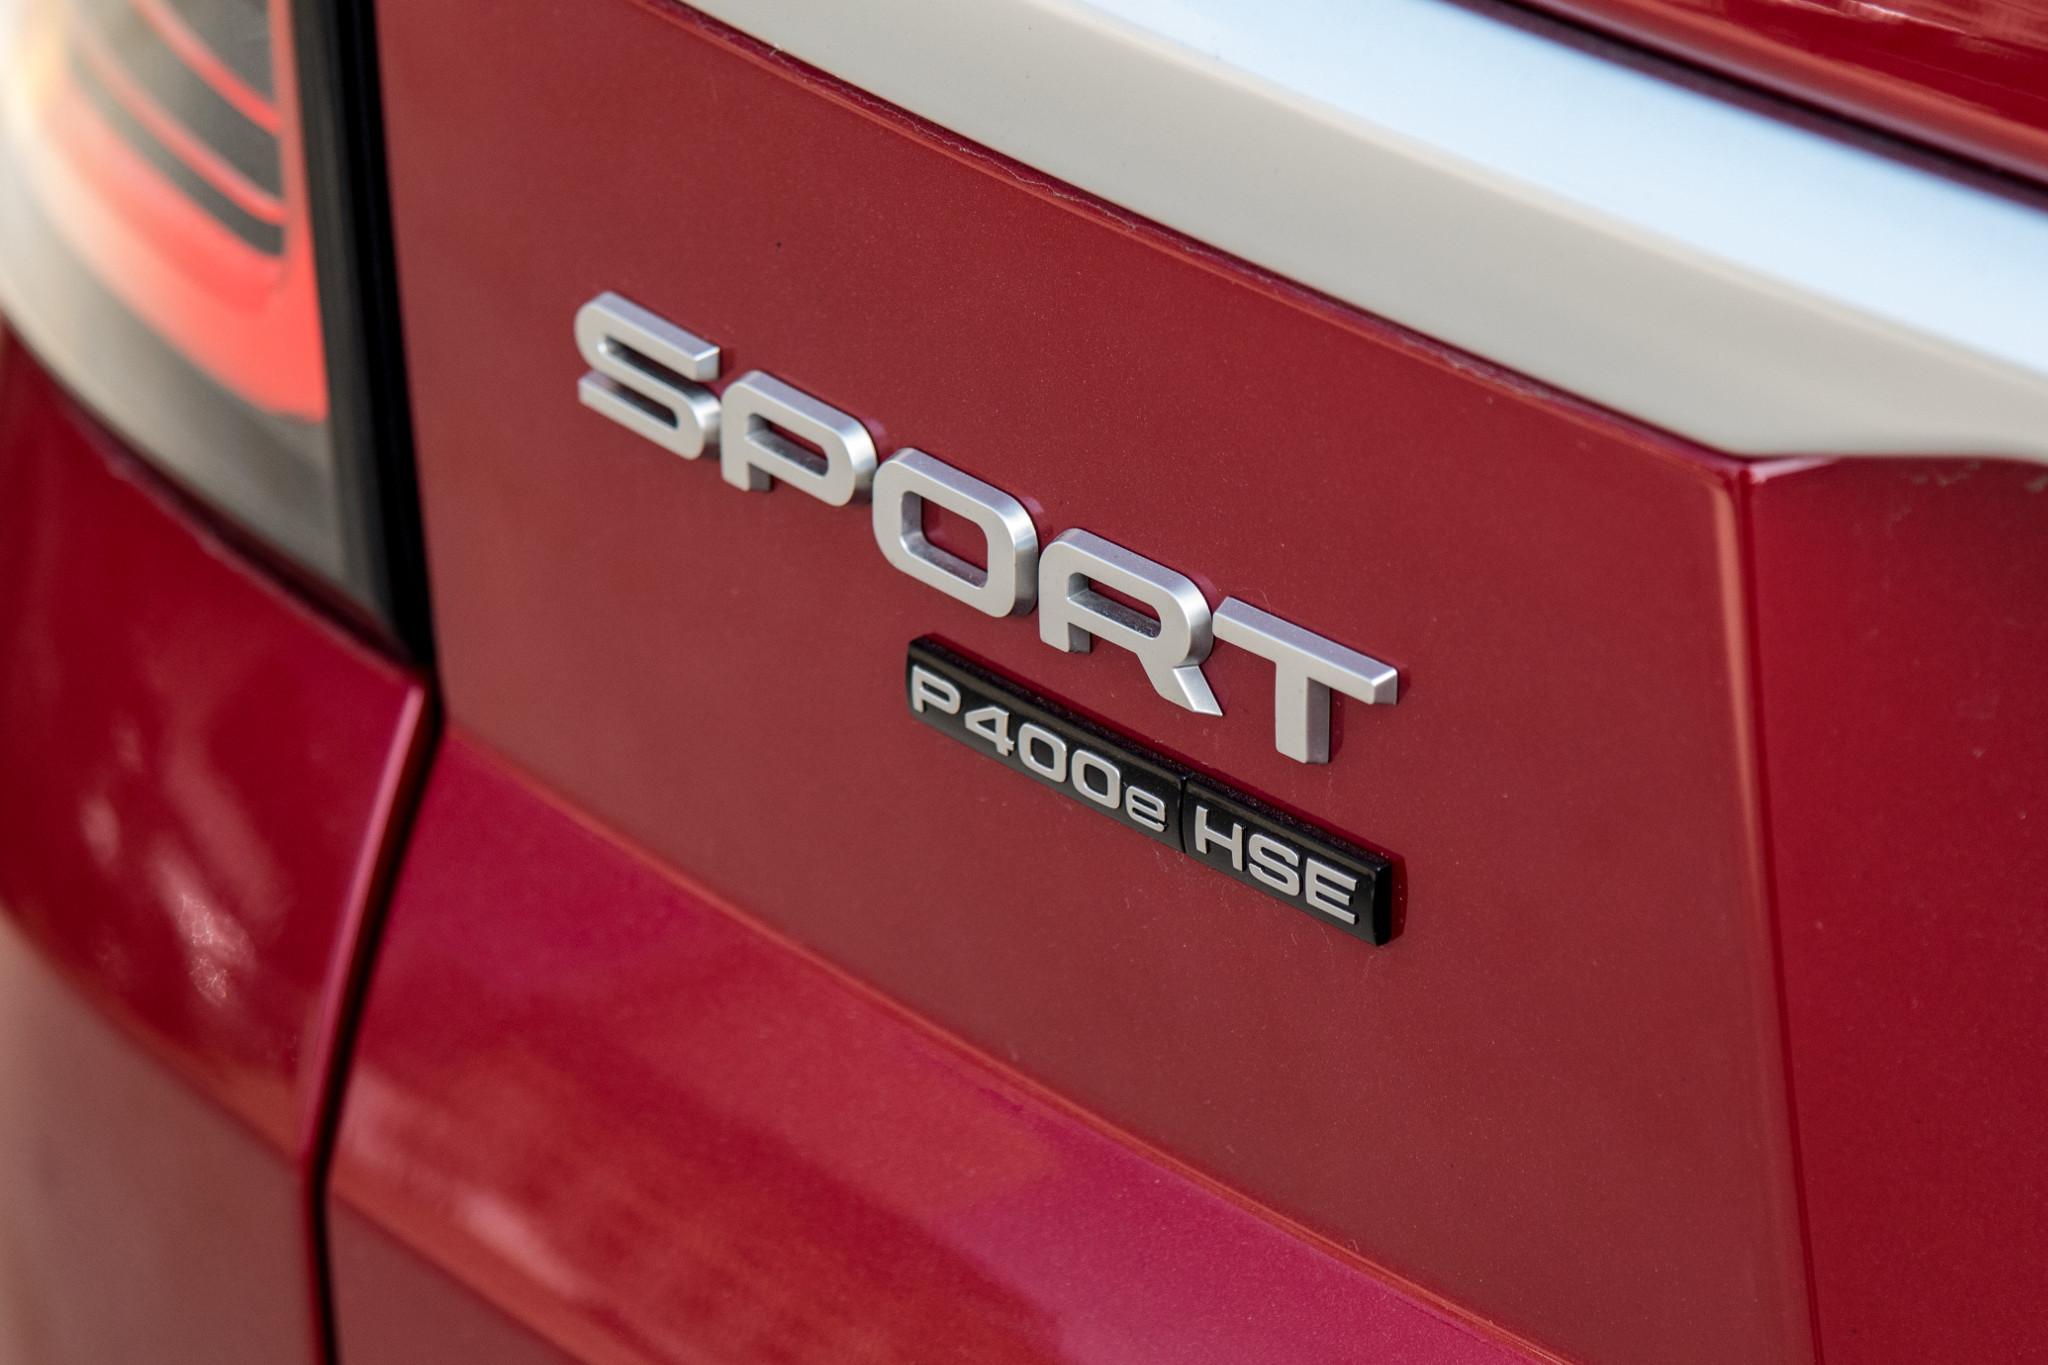 land-rover-range-rover-sport-2020-12-badge--exterior--rear--red.jpg